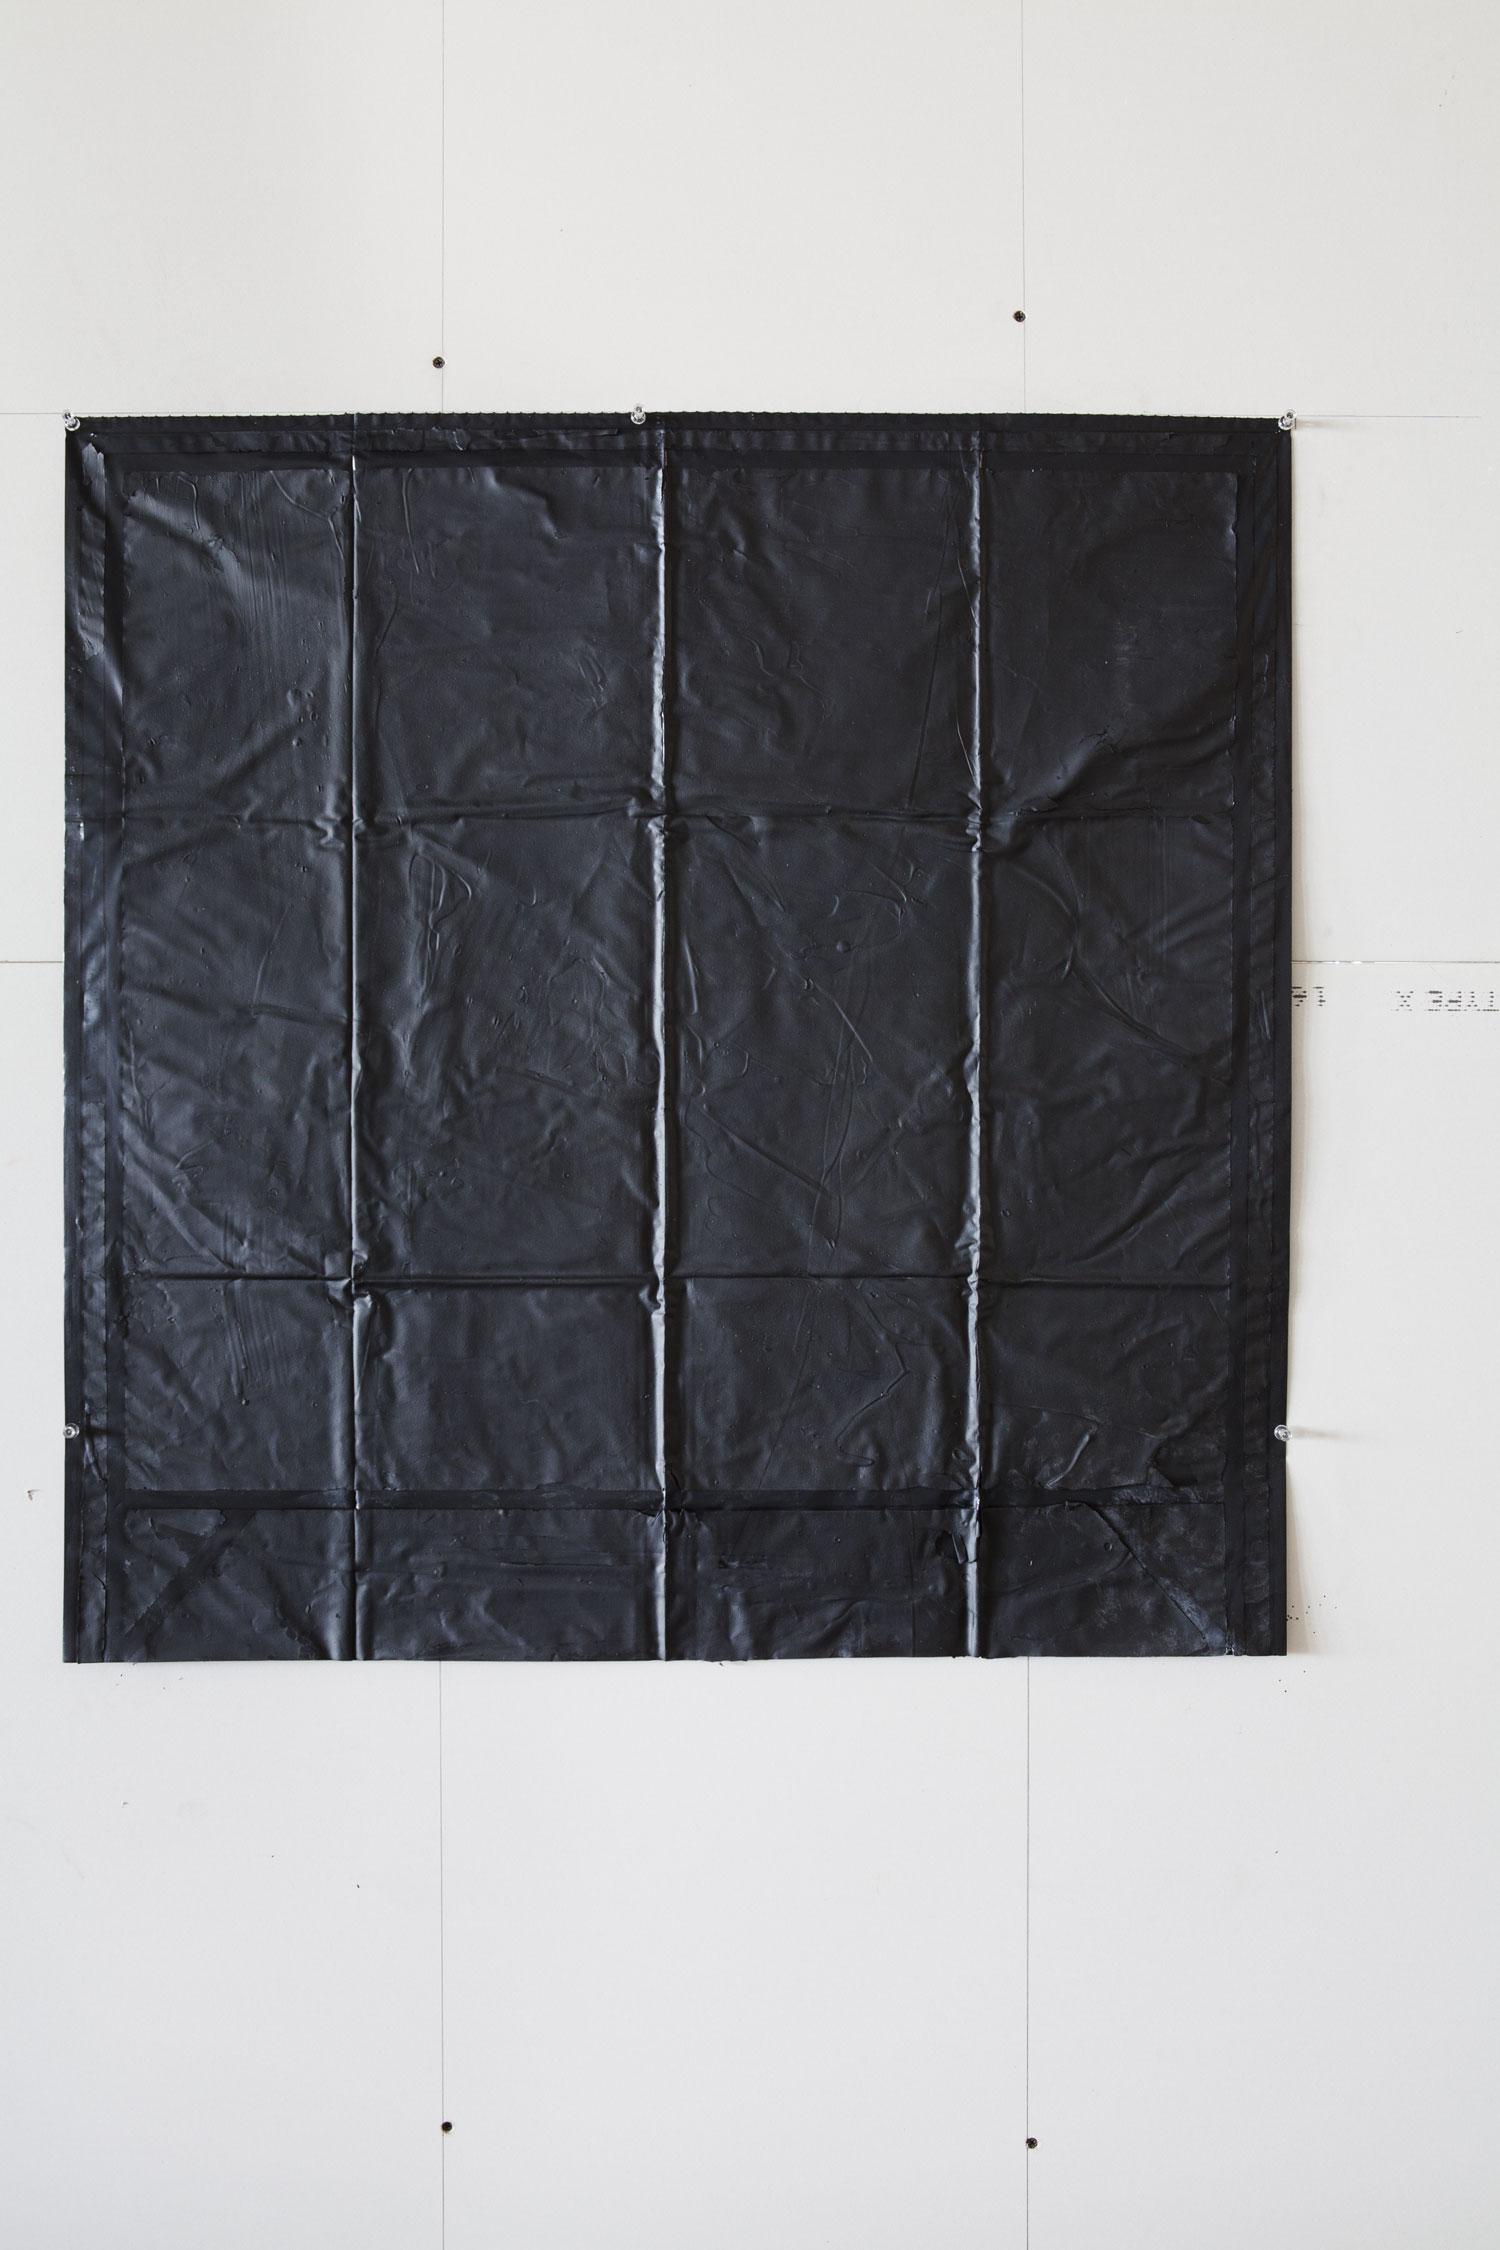 Movements outside Square, garbage bag ( Black Box inside square ) 2013    American coal tar on black garbage bag  Size: Around 90 X 90 cm  Photographer: Amina Hasen